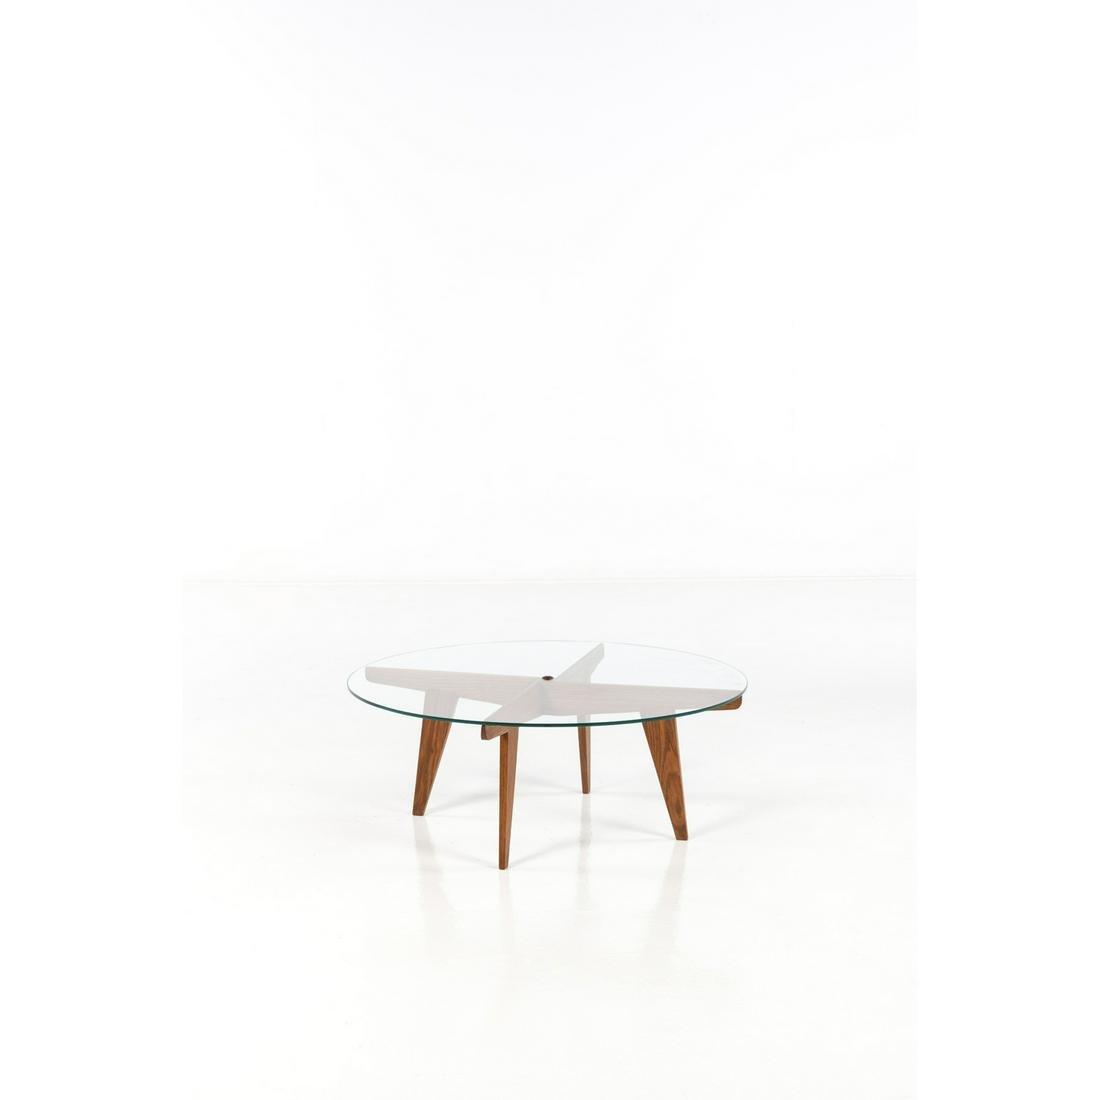 Gio Ponti (1891-1979) Coffee table Walnut wood and